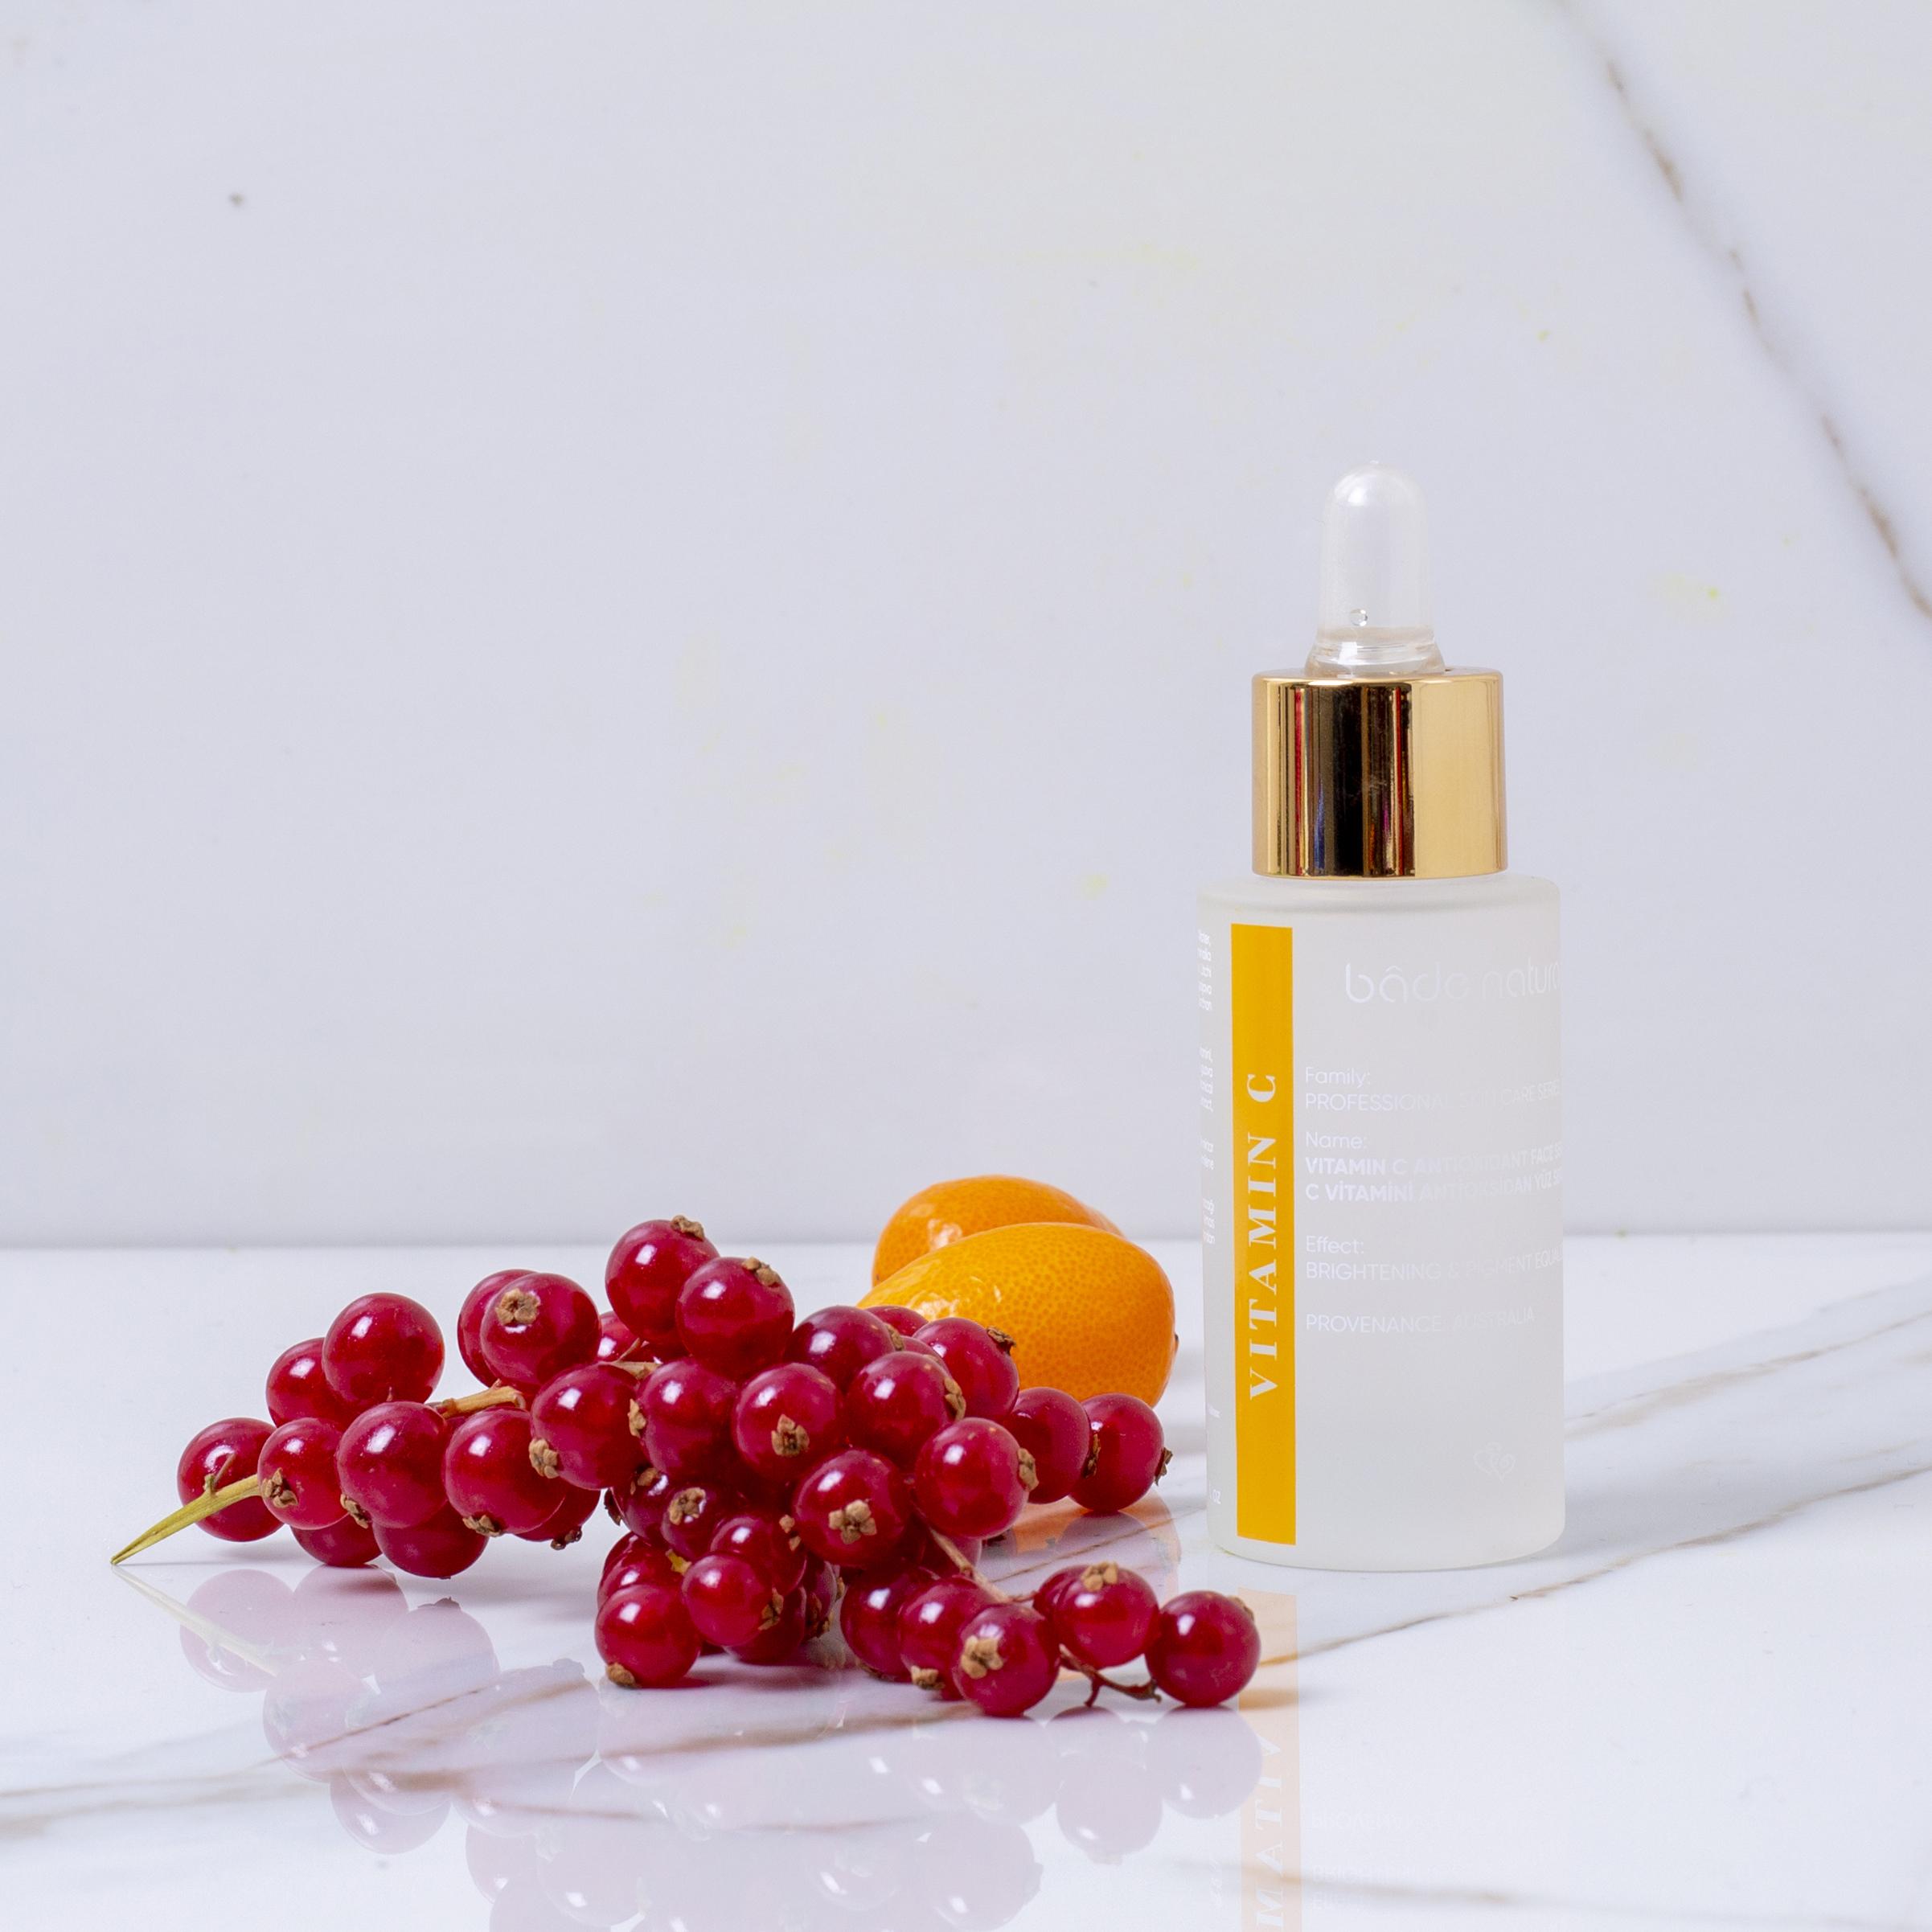 BN201 – Vitamin C Antioxidant Face Serum